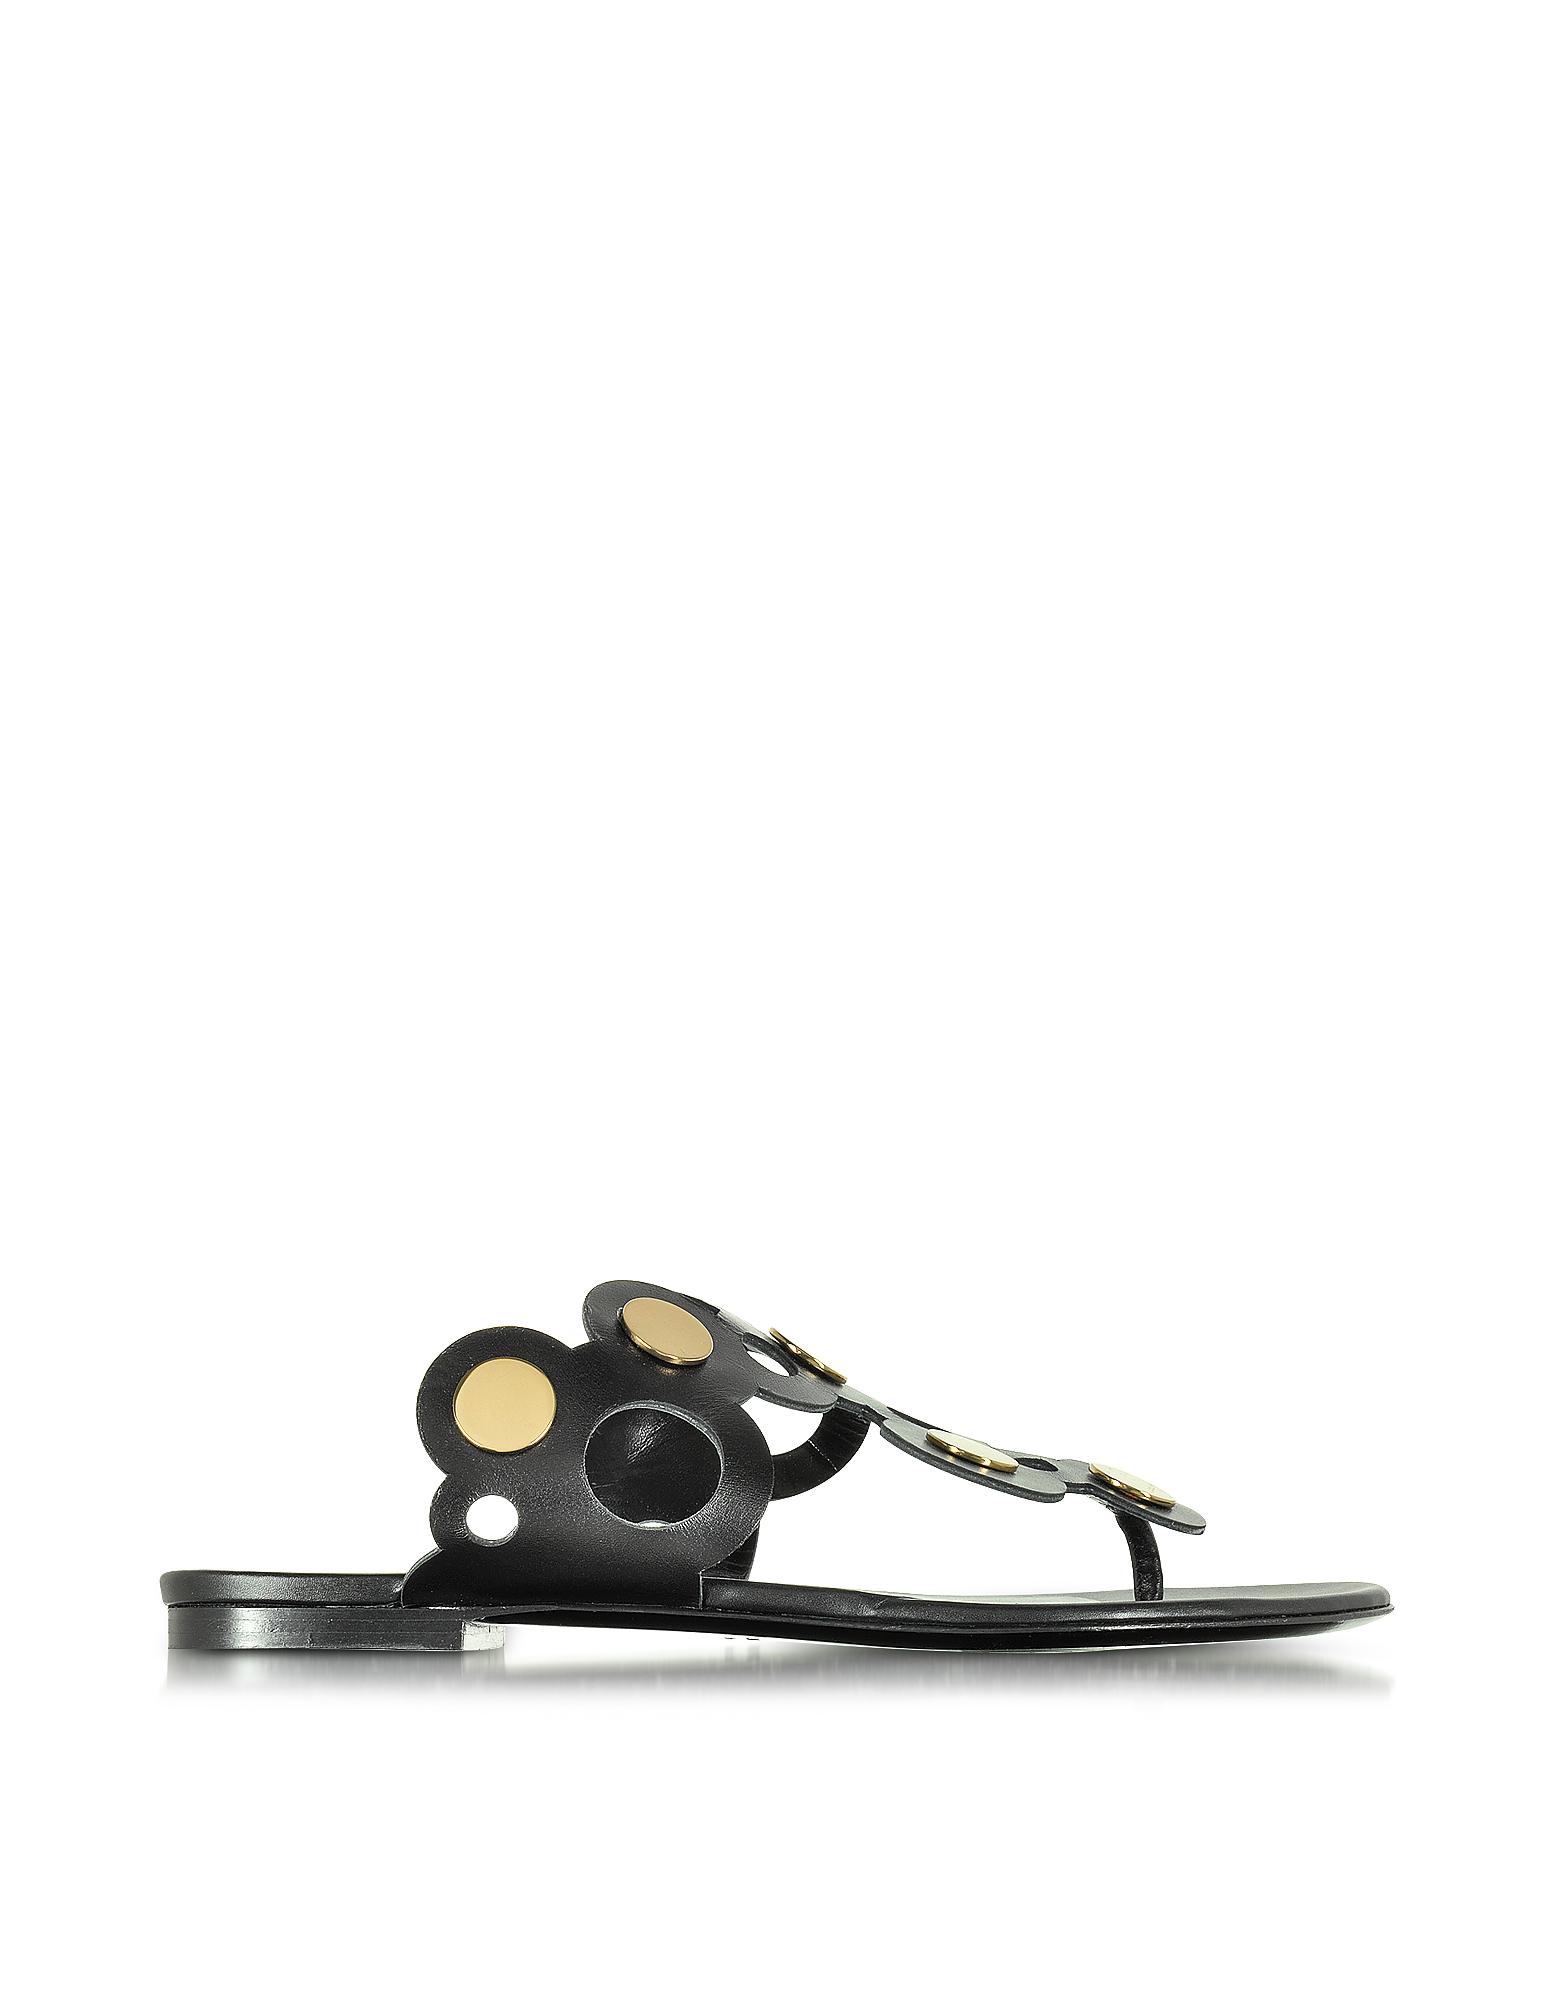 Pierre Hardy Shoes, Black Leather Penny Lace Flat Mule